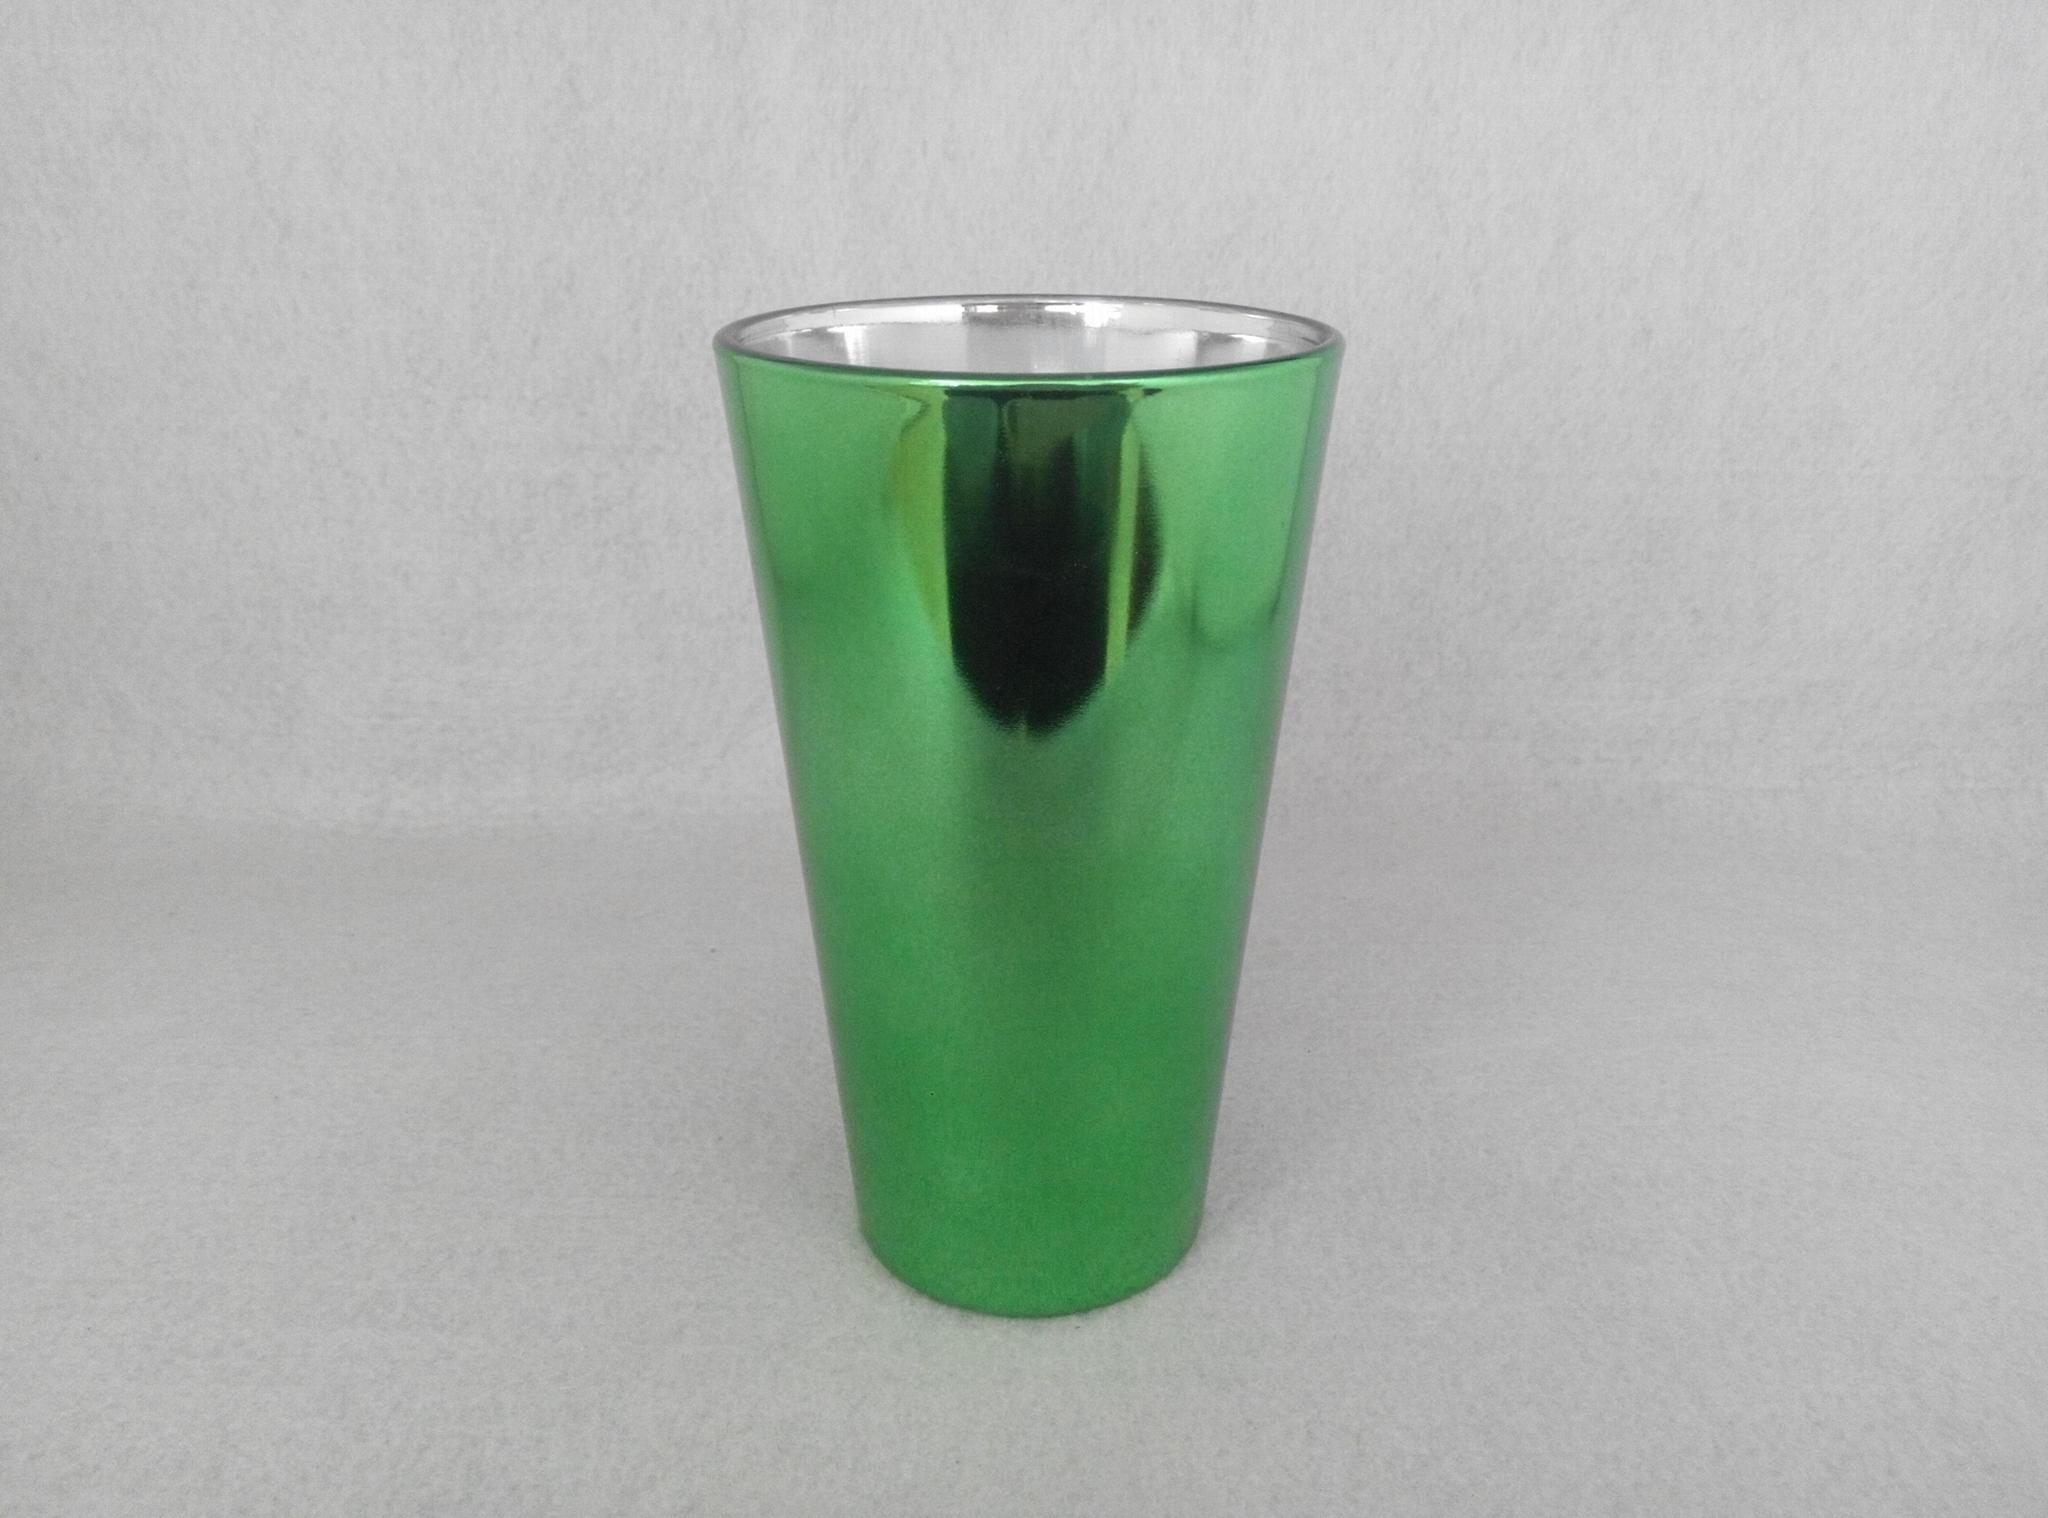 16OZ Laser Engrared glass mug 3